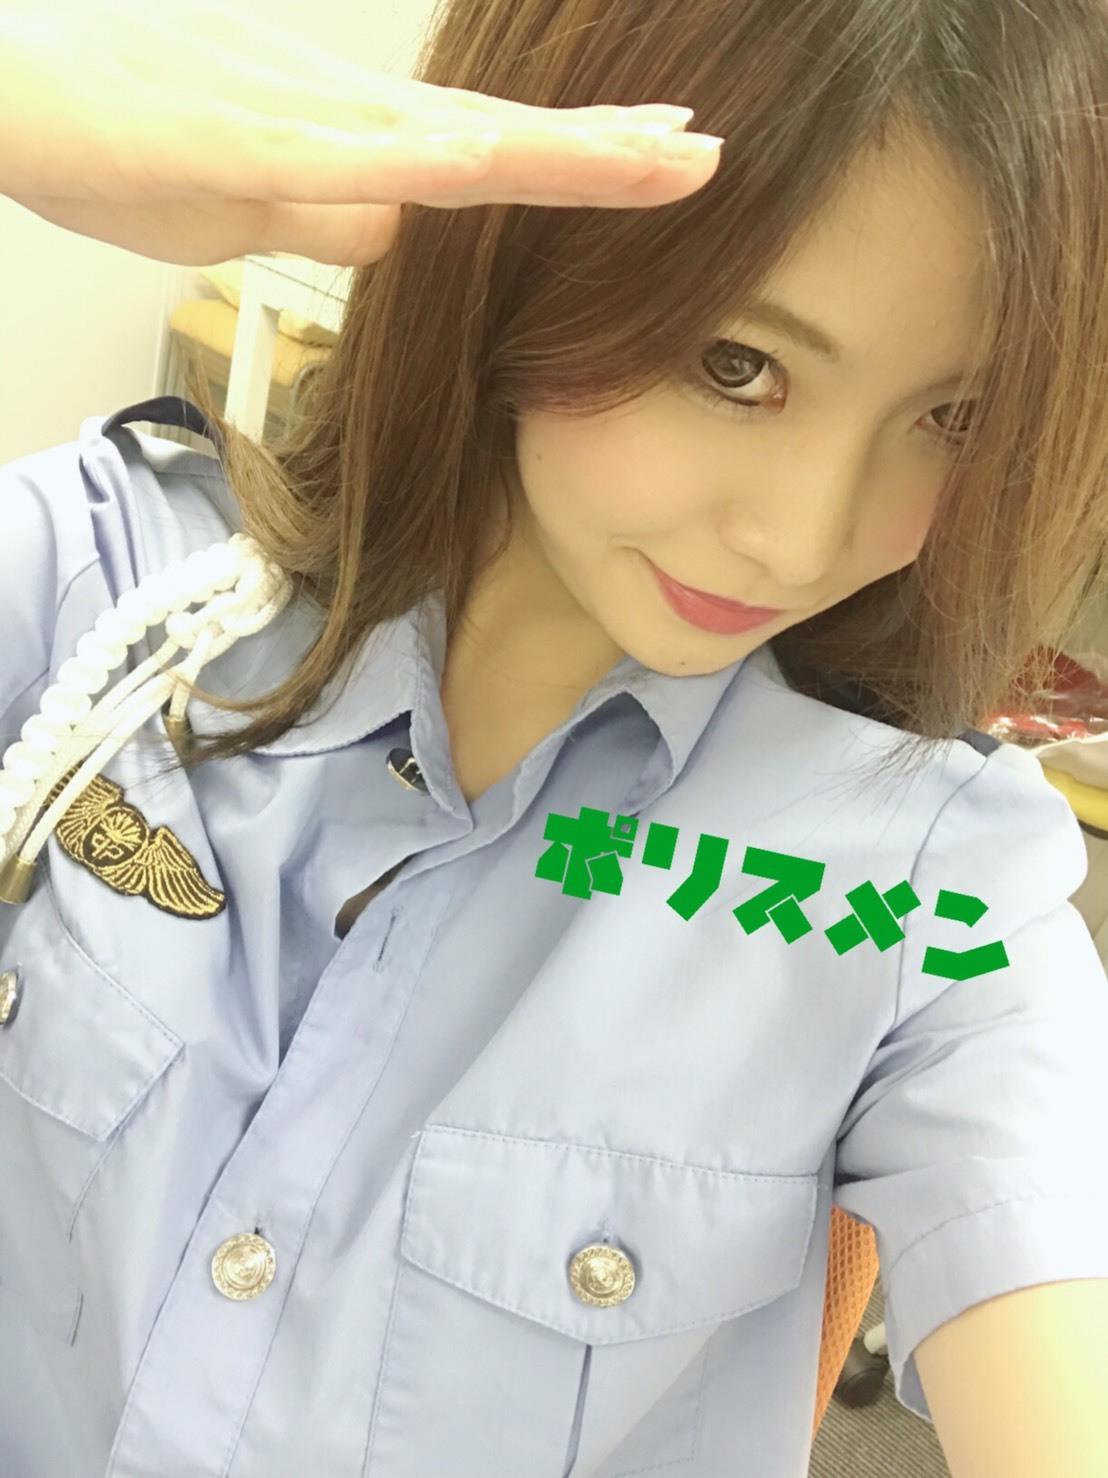 S__7389201.jpg